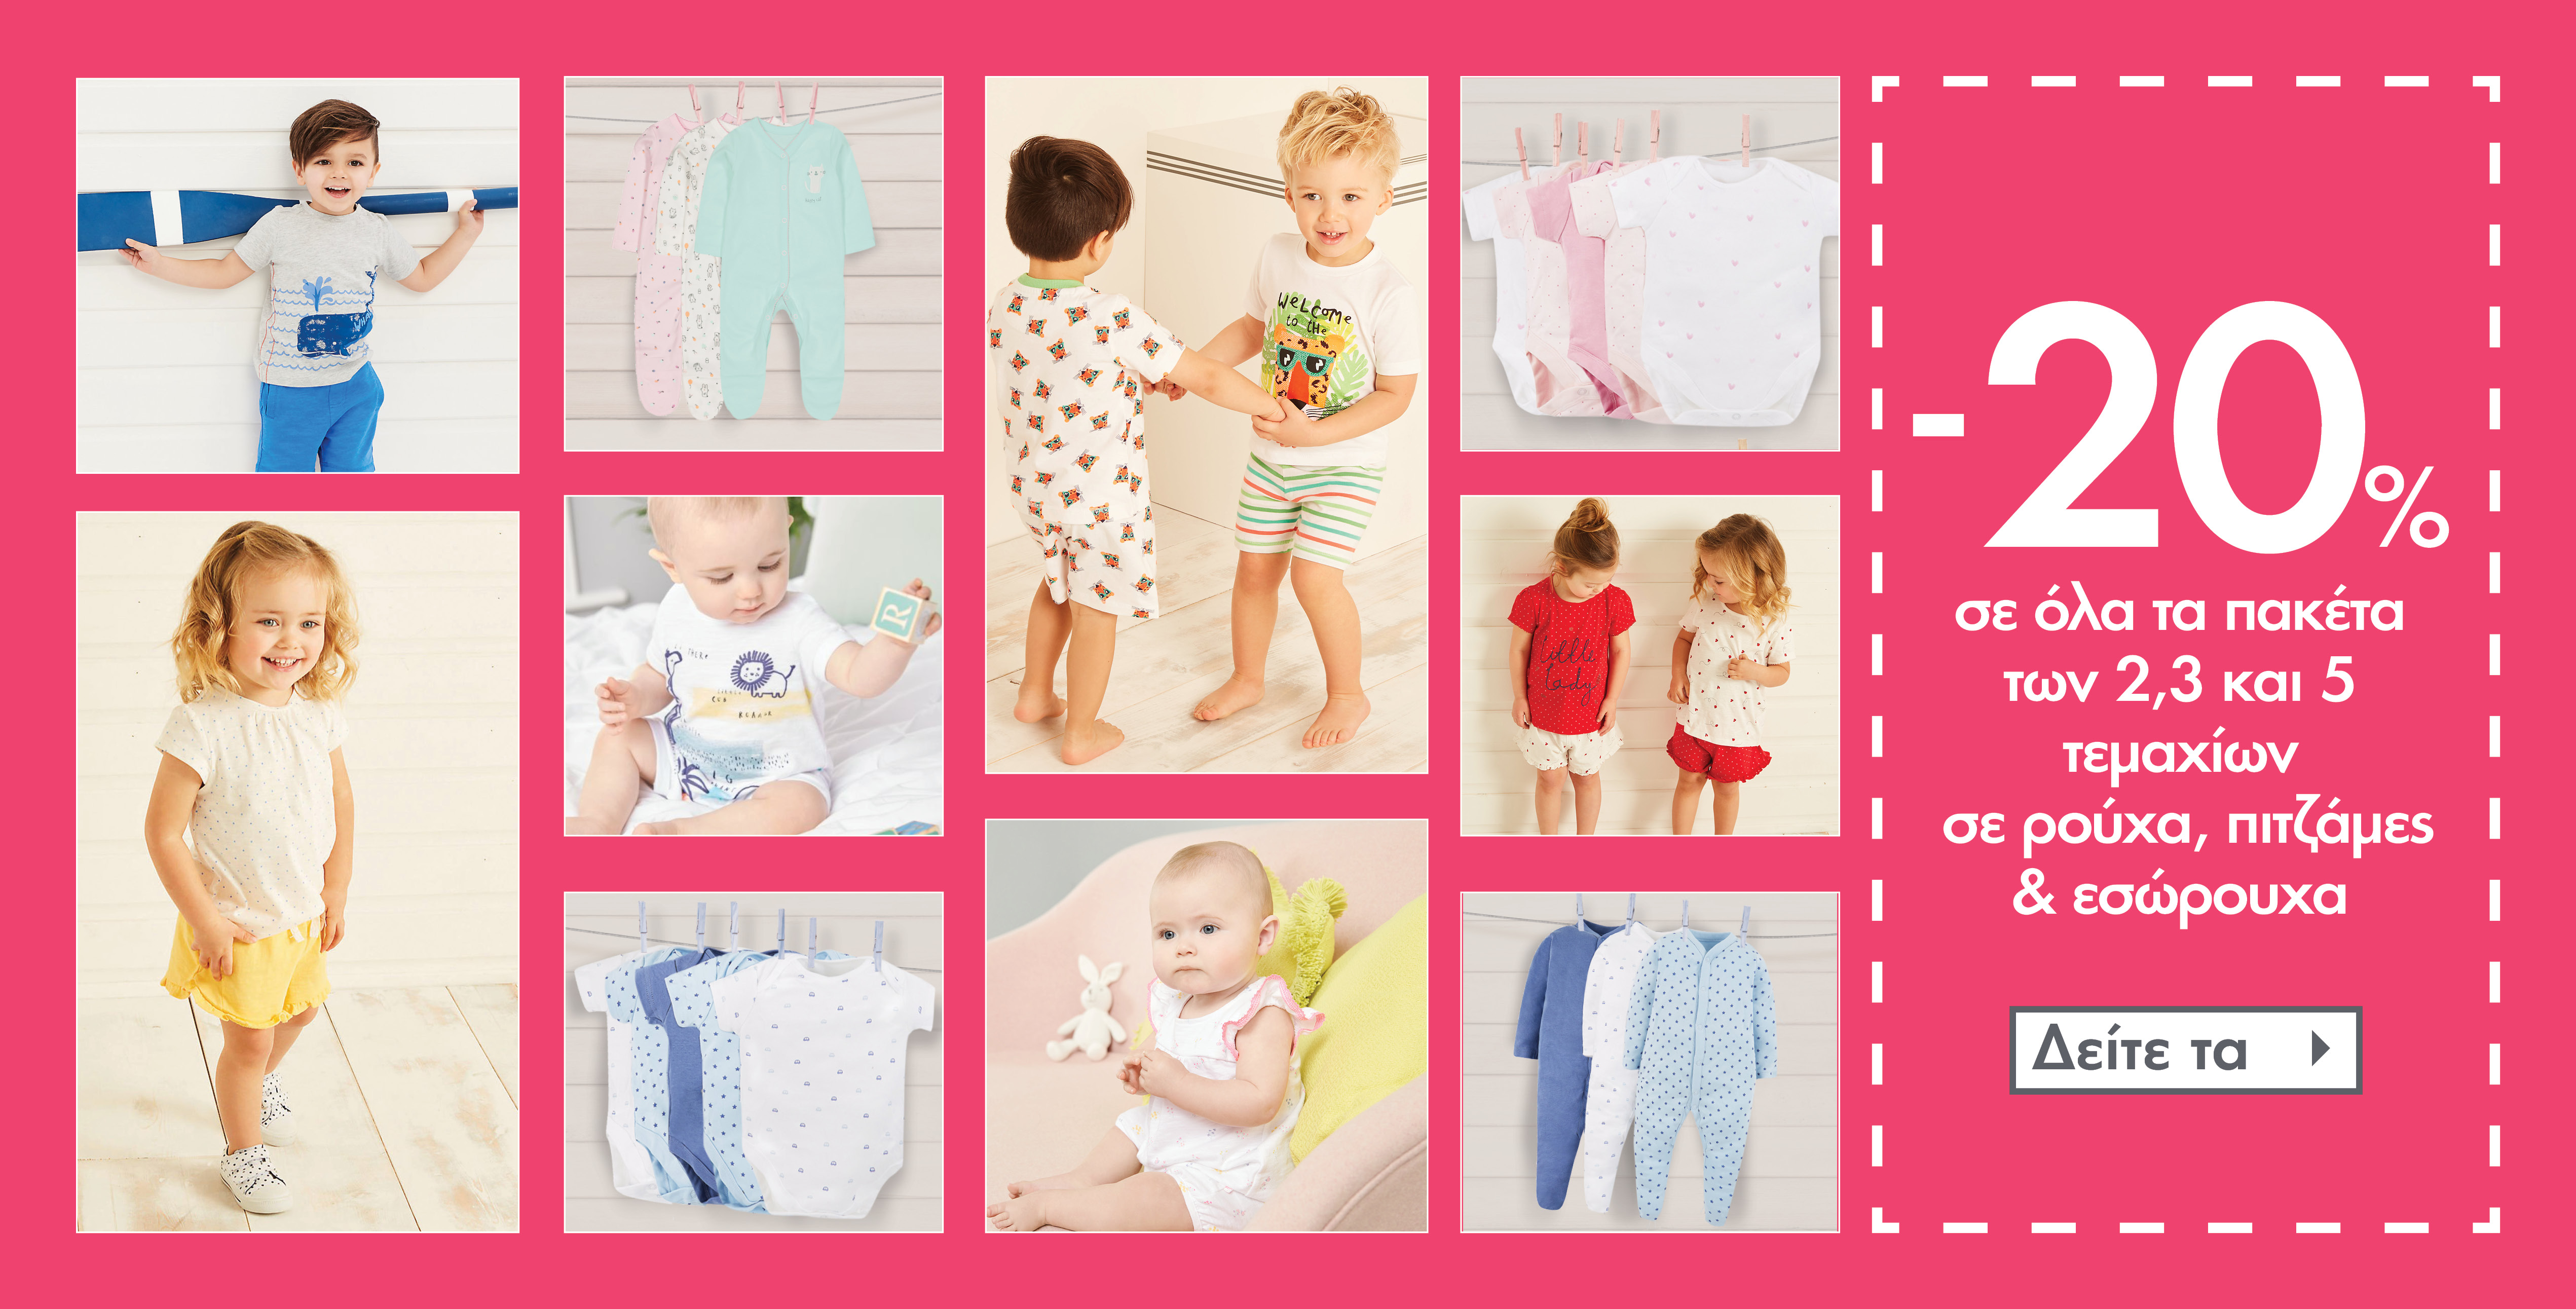 2b001e93c93 Καρότσια, παιδικά, βρεφικά και ρούχα εγκυμοσύνης από το Mothercare